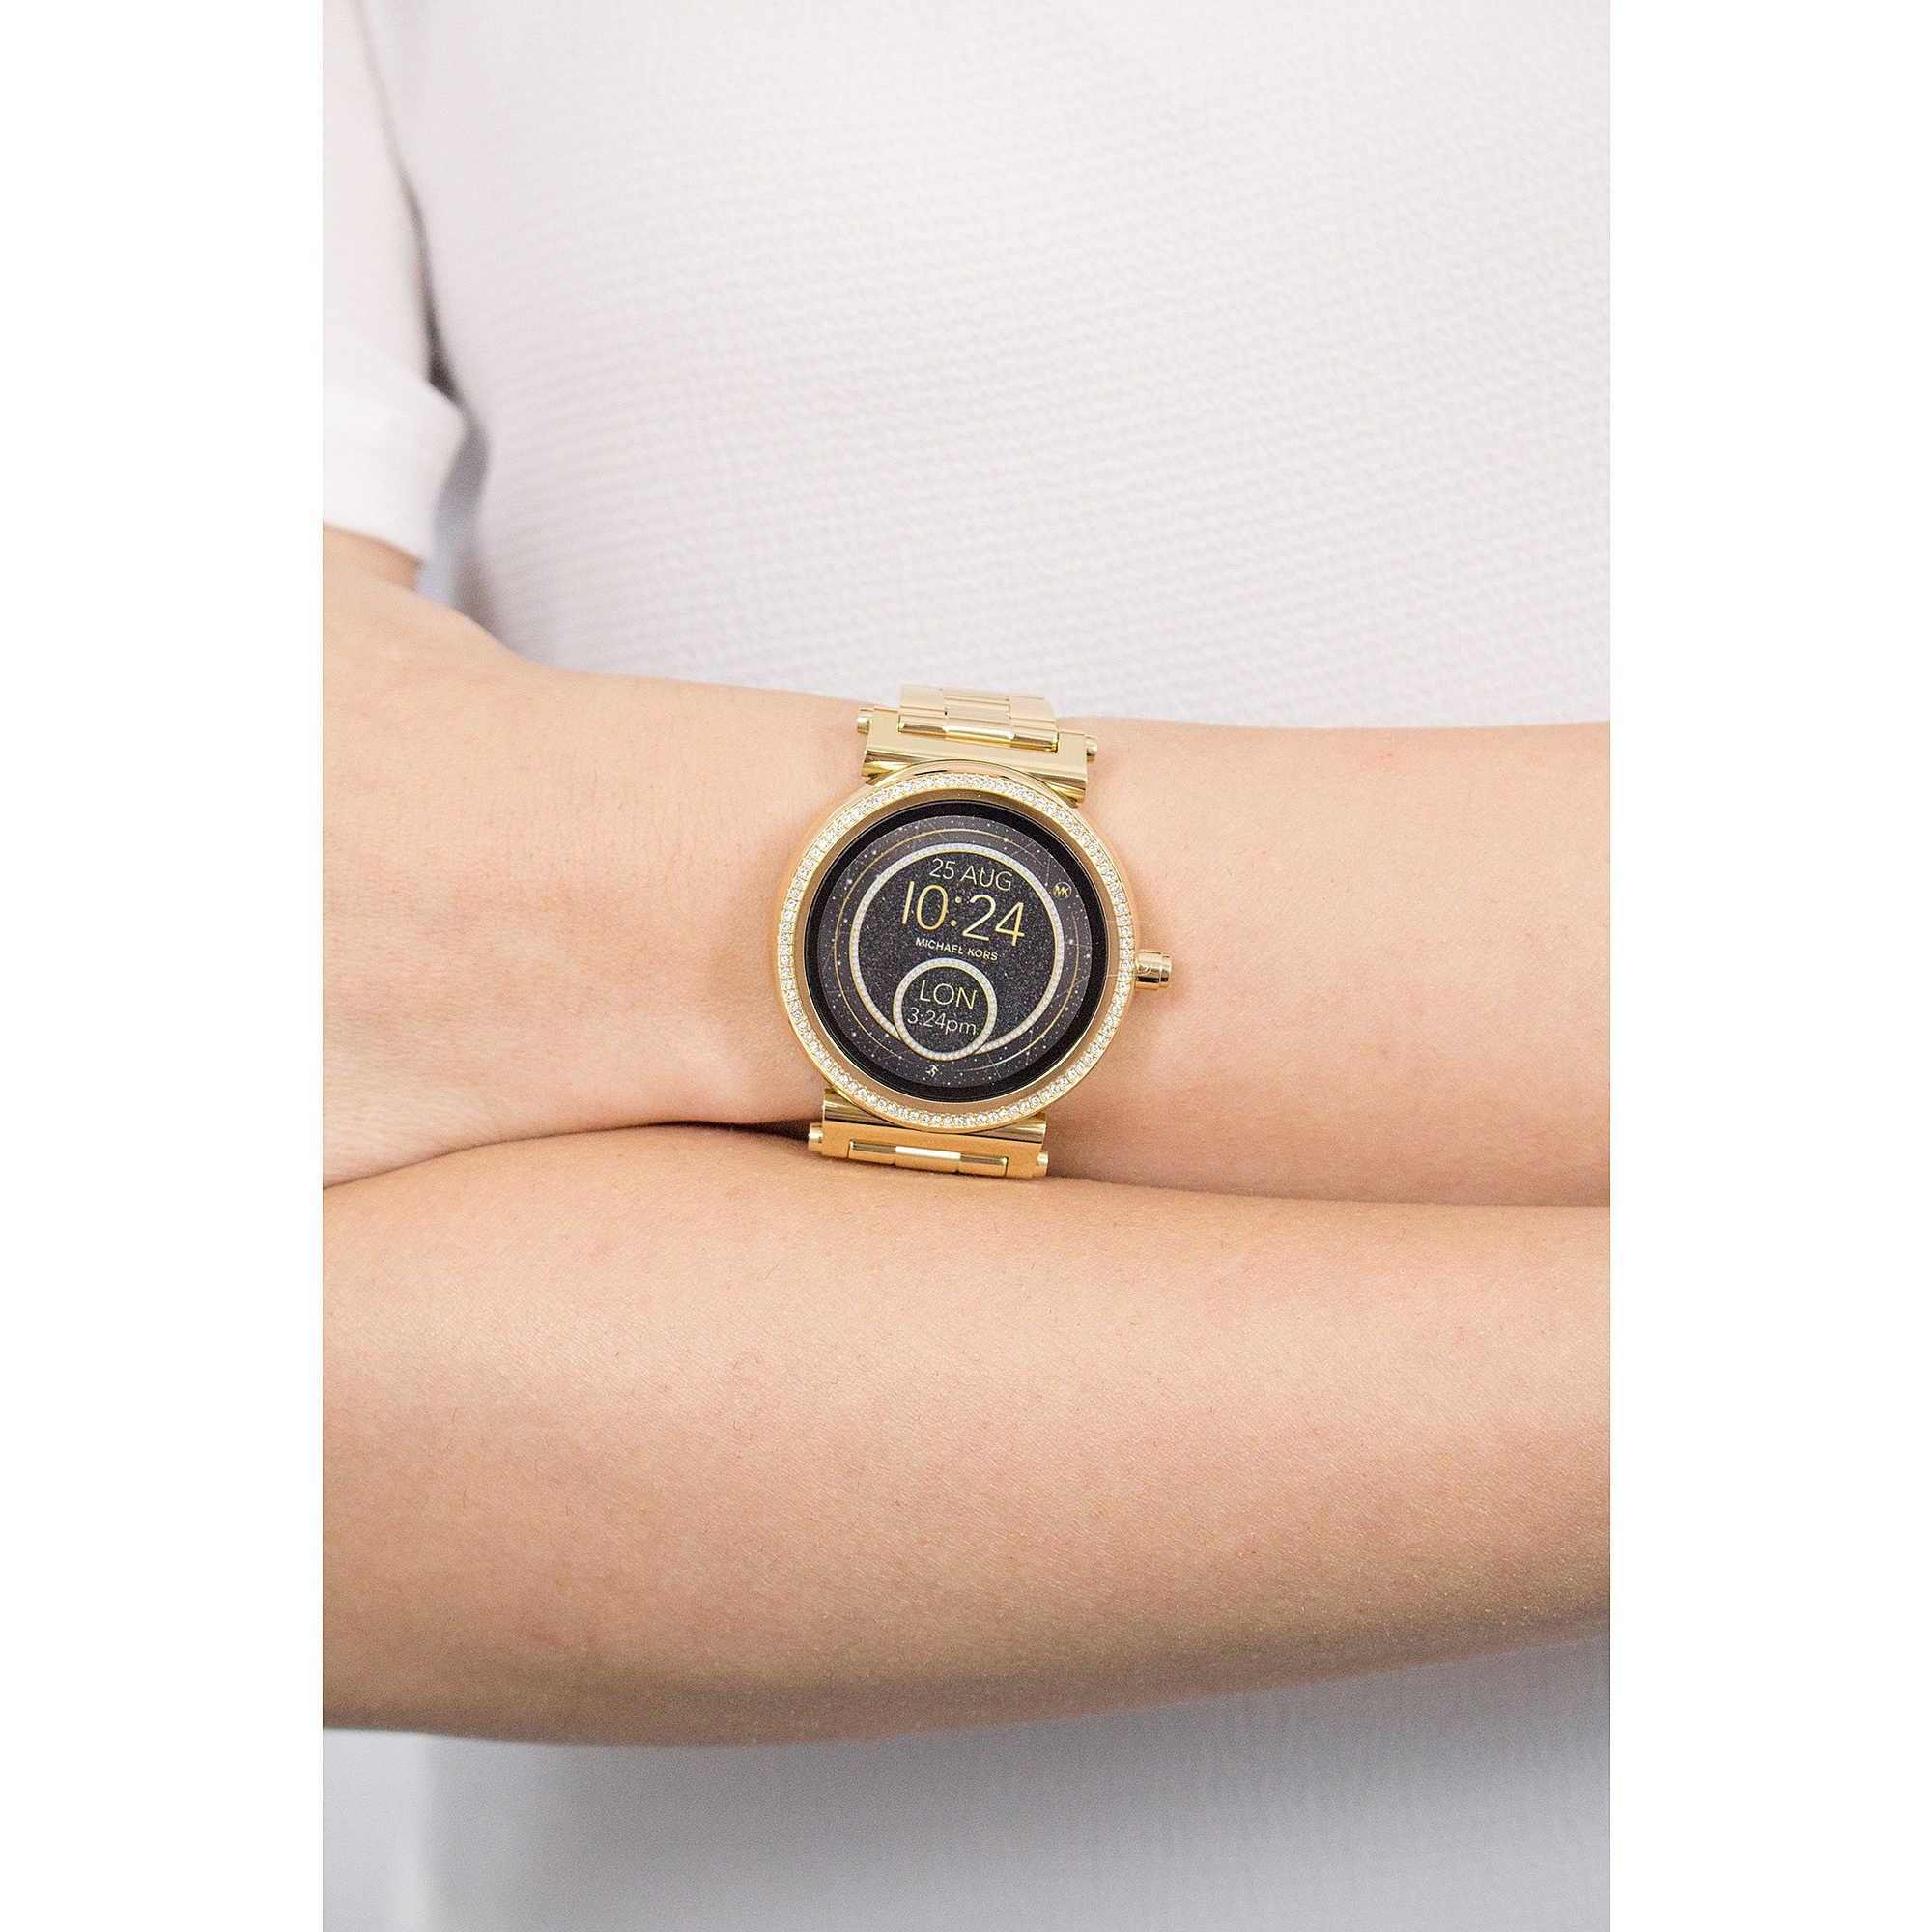 uhr smartwatch frau michael kors sofie mkt5021 smartwatches michael kors. Black Bedroom Furniture Sets. Home Design Ideas